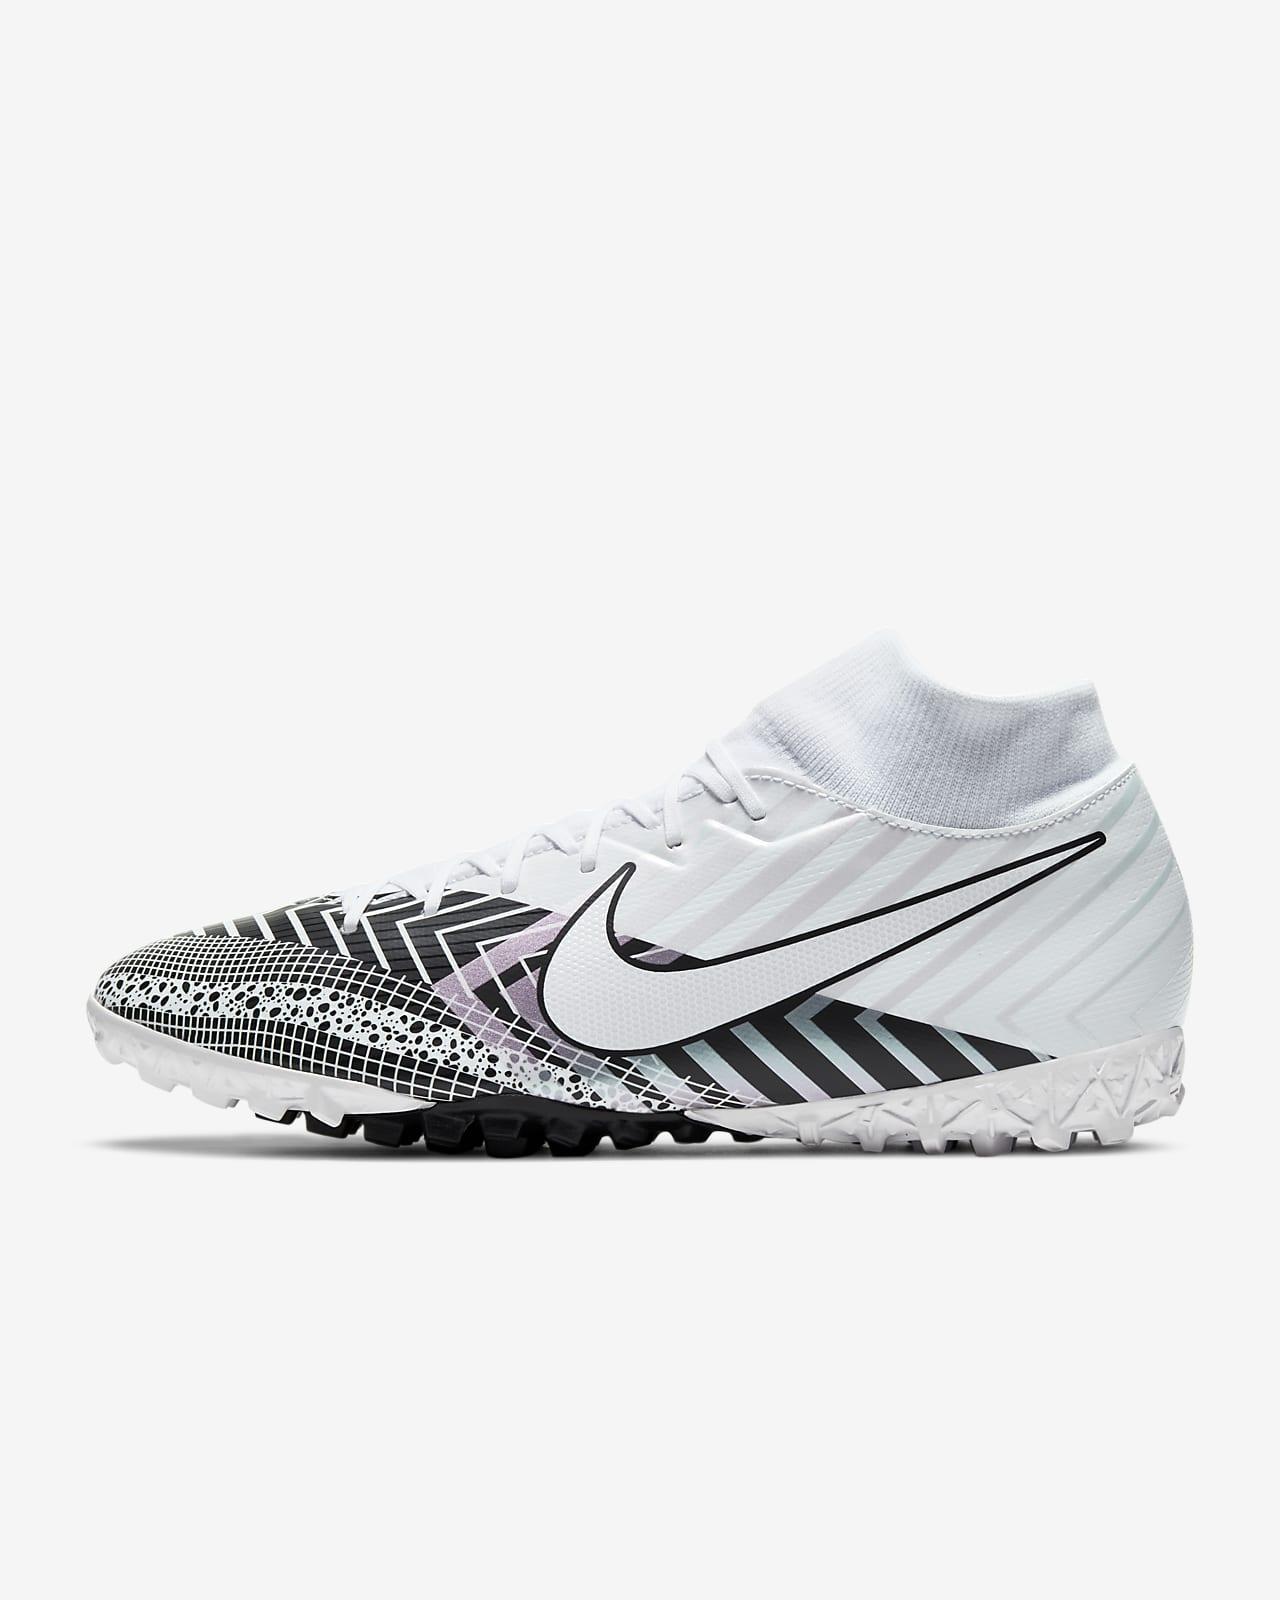 Chaussure de football pour surface synthétique Nike